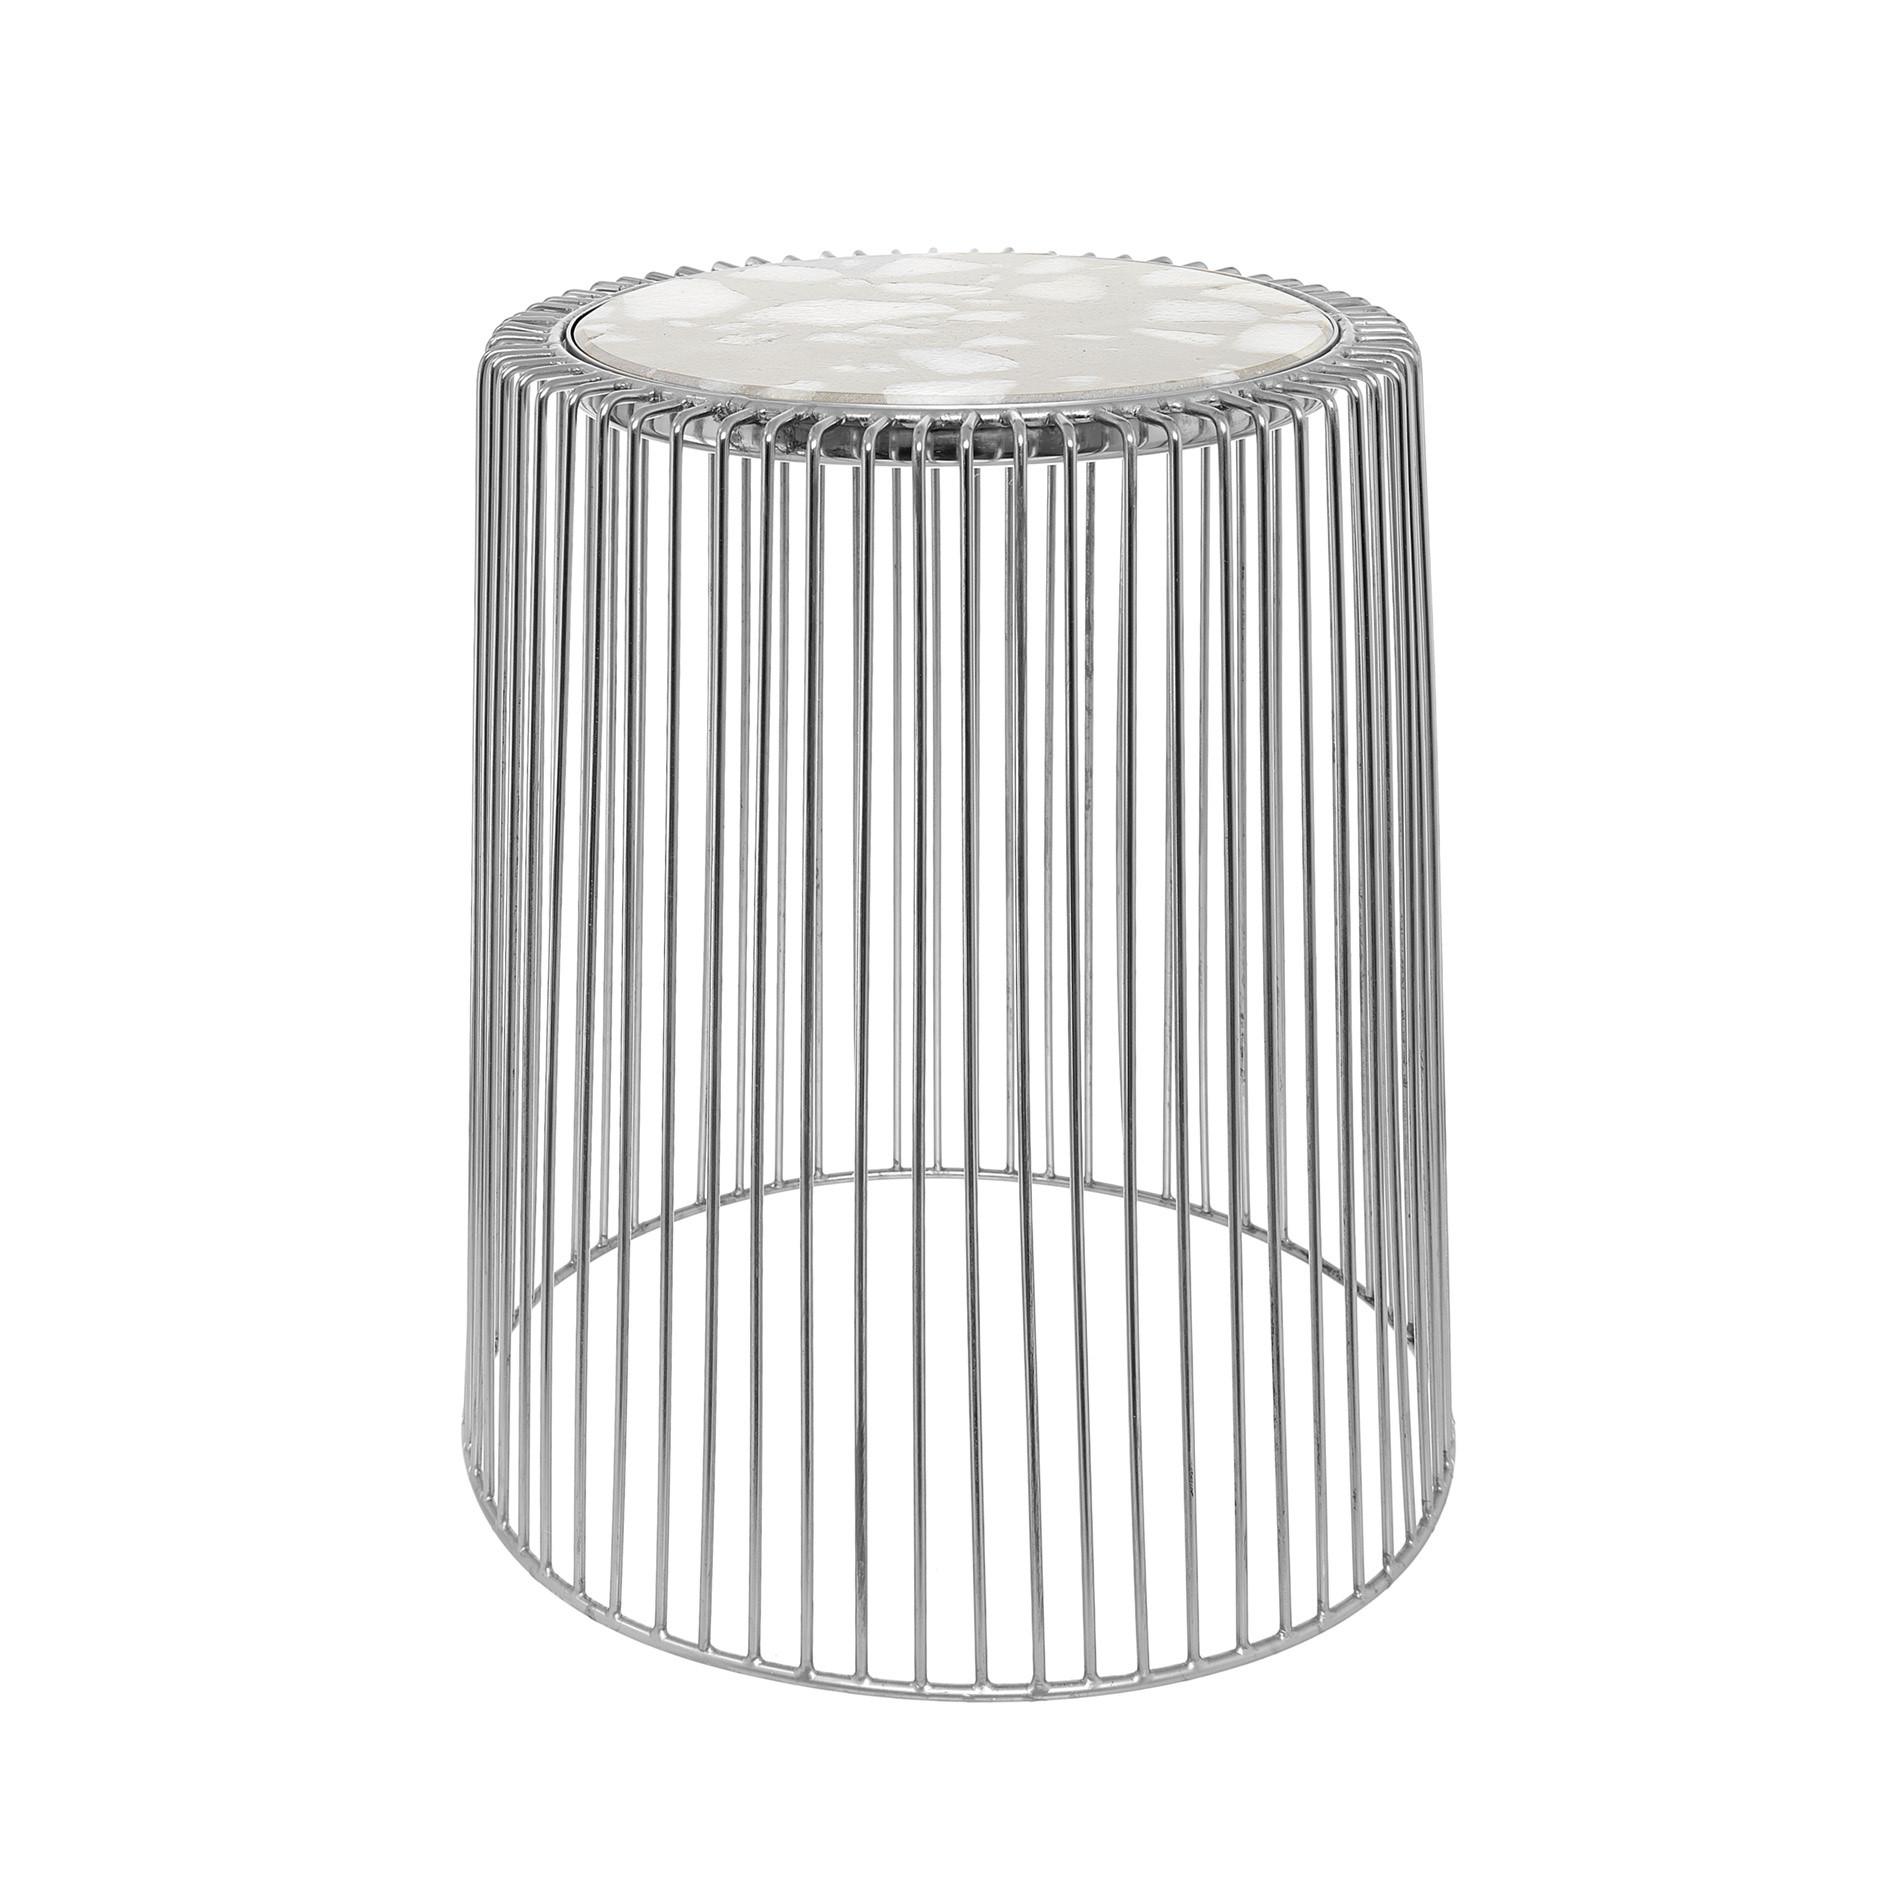 Tavolino in alluminio cromato e pietra Marble, Grigio argento, large image number 0